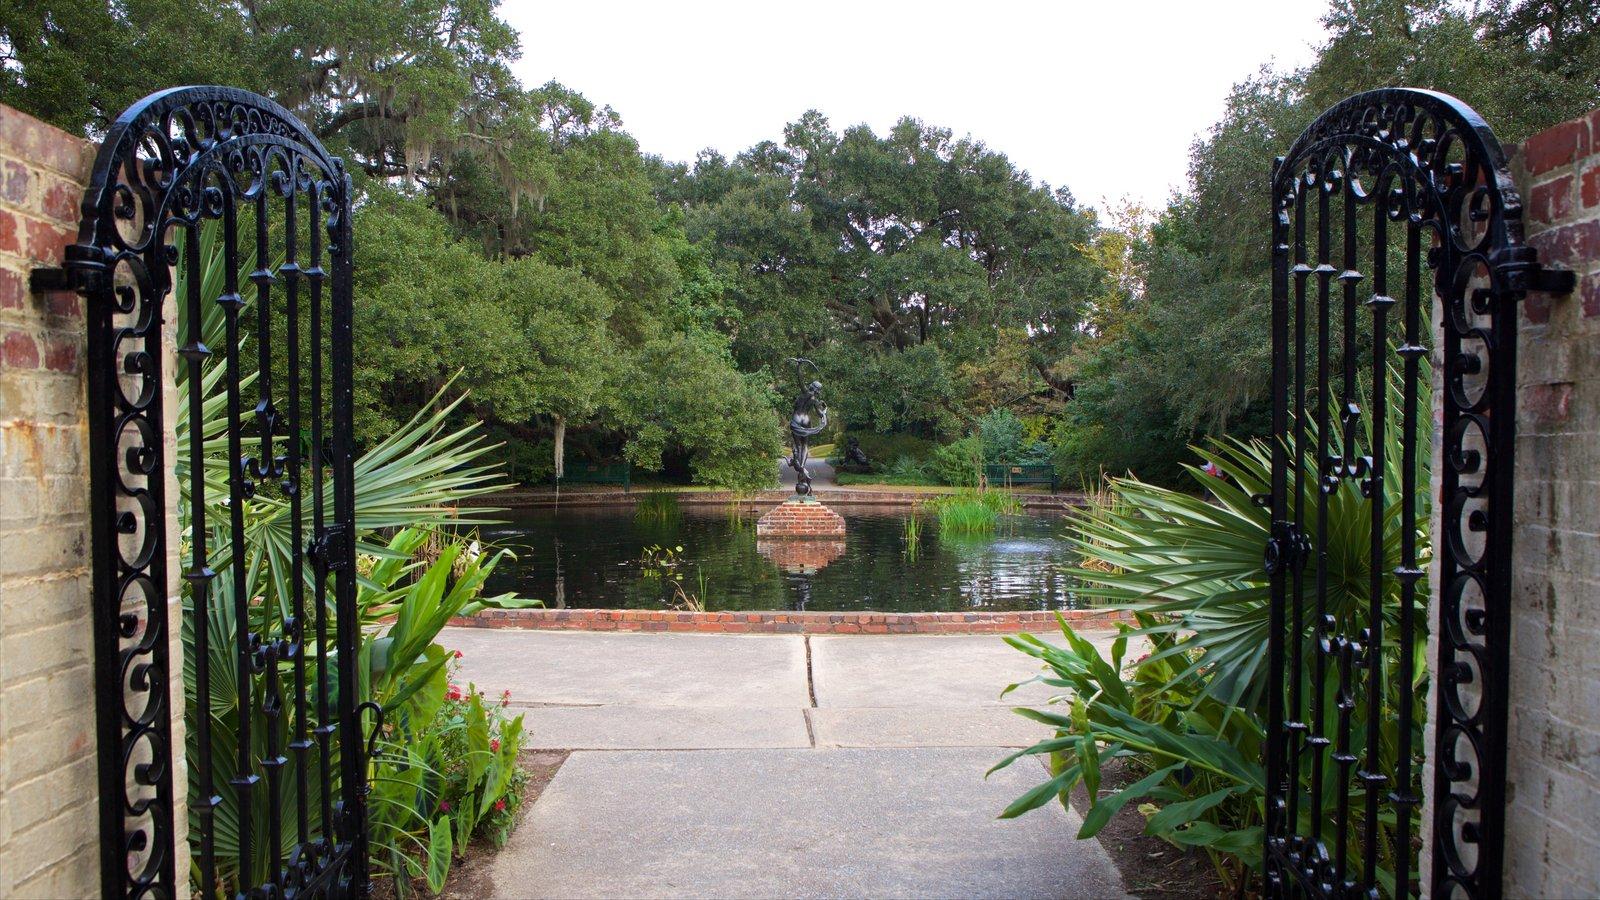 Brookgreen Gardens Pictures: View Photos & Images of Brookgreen Gardens